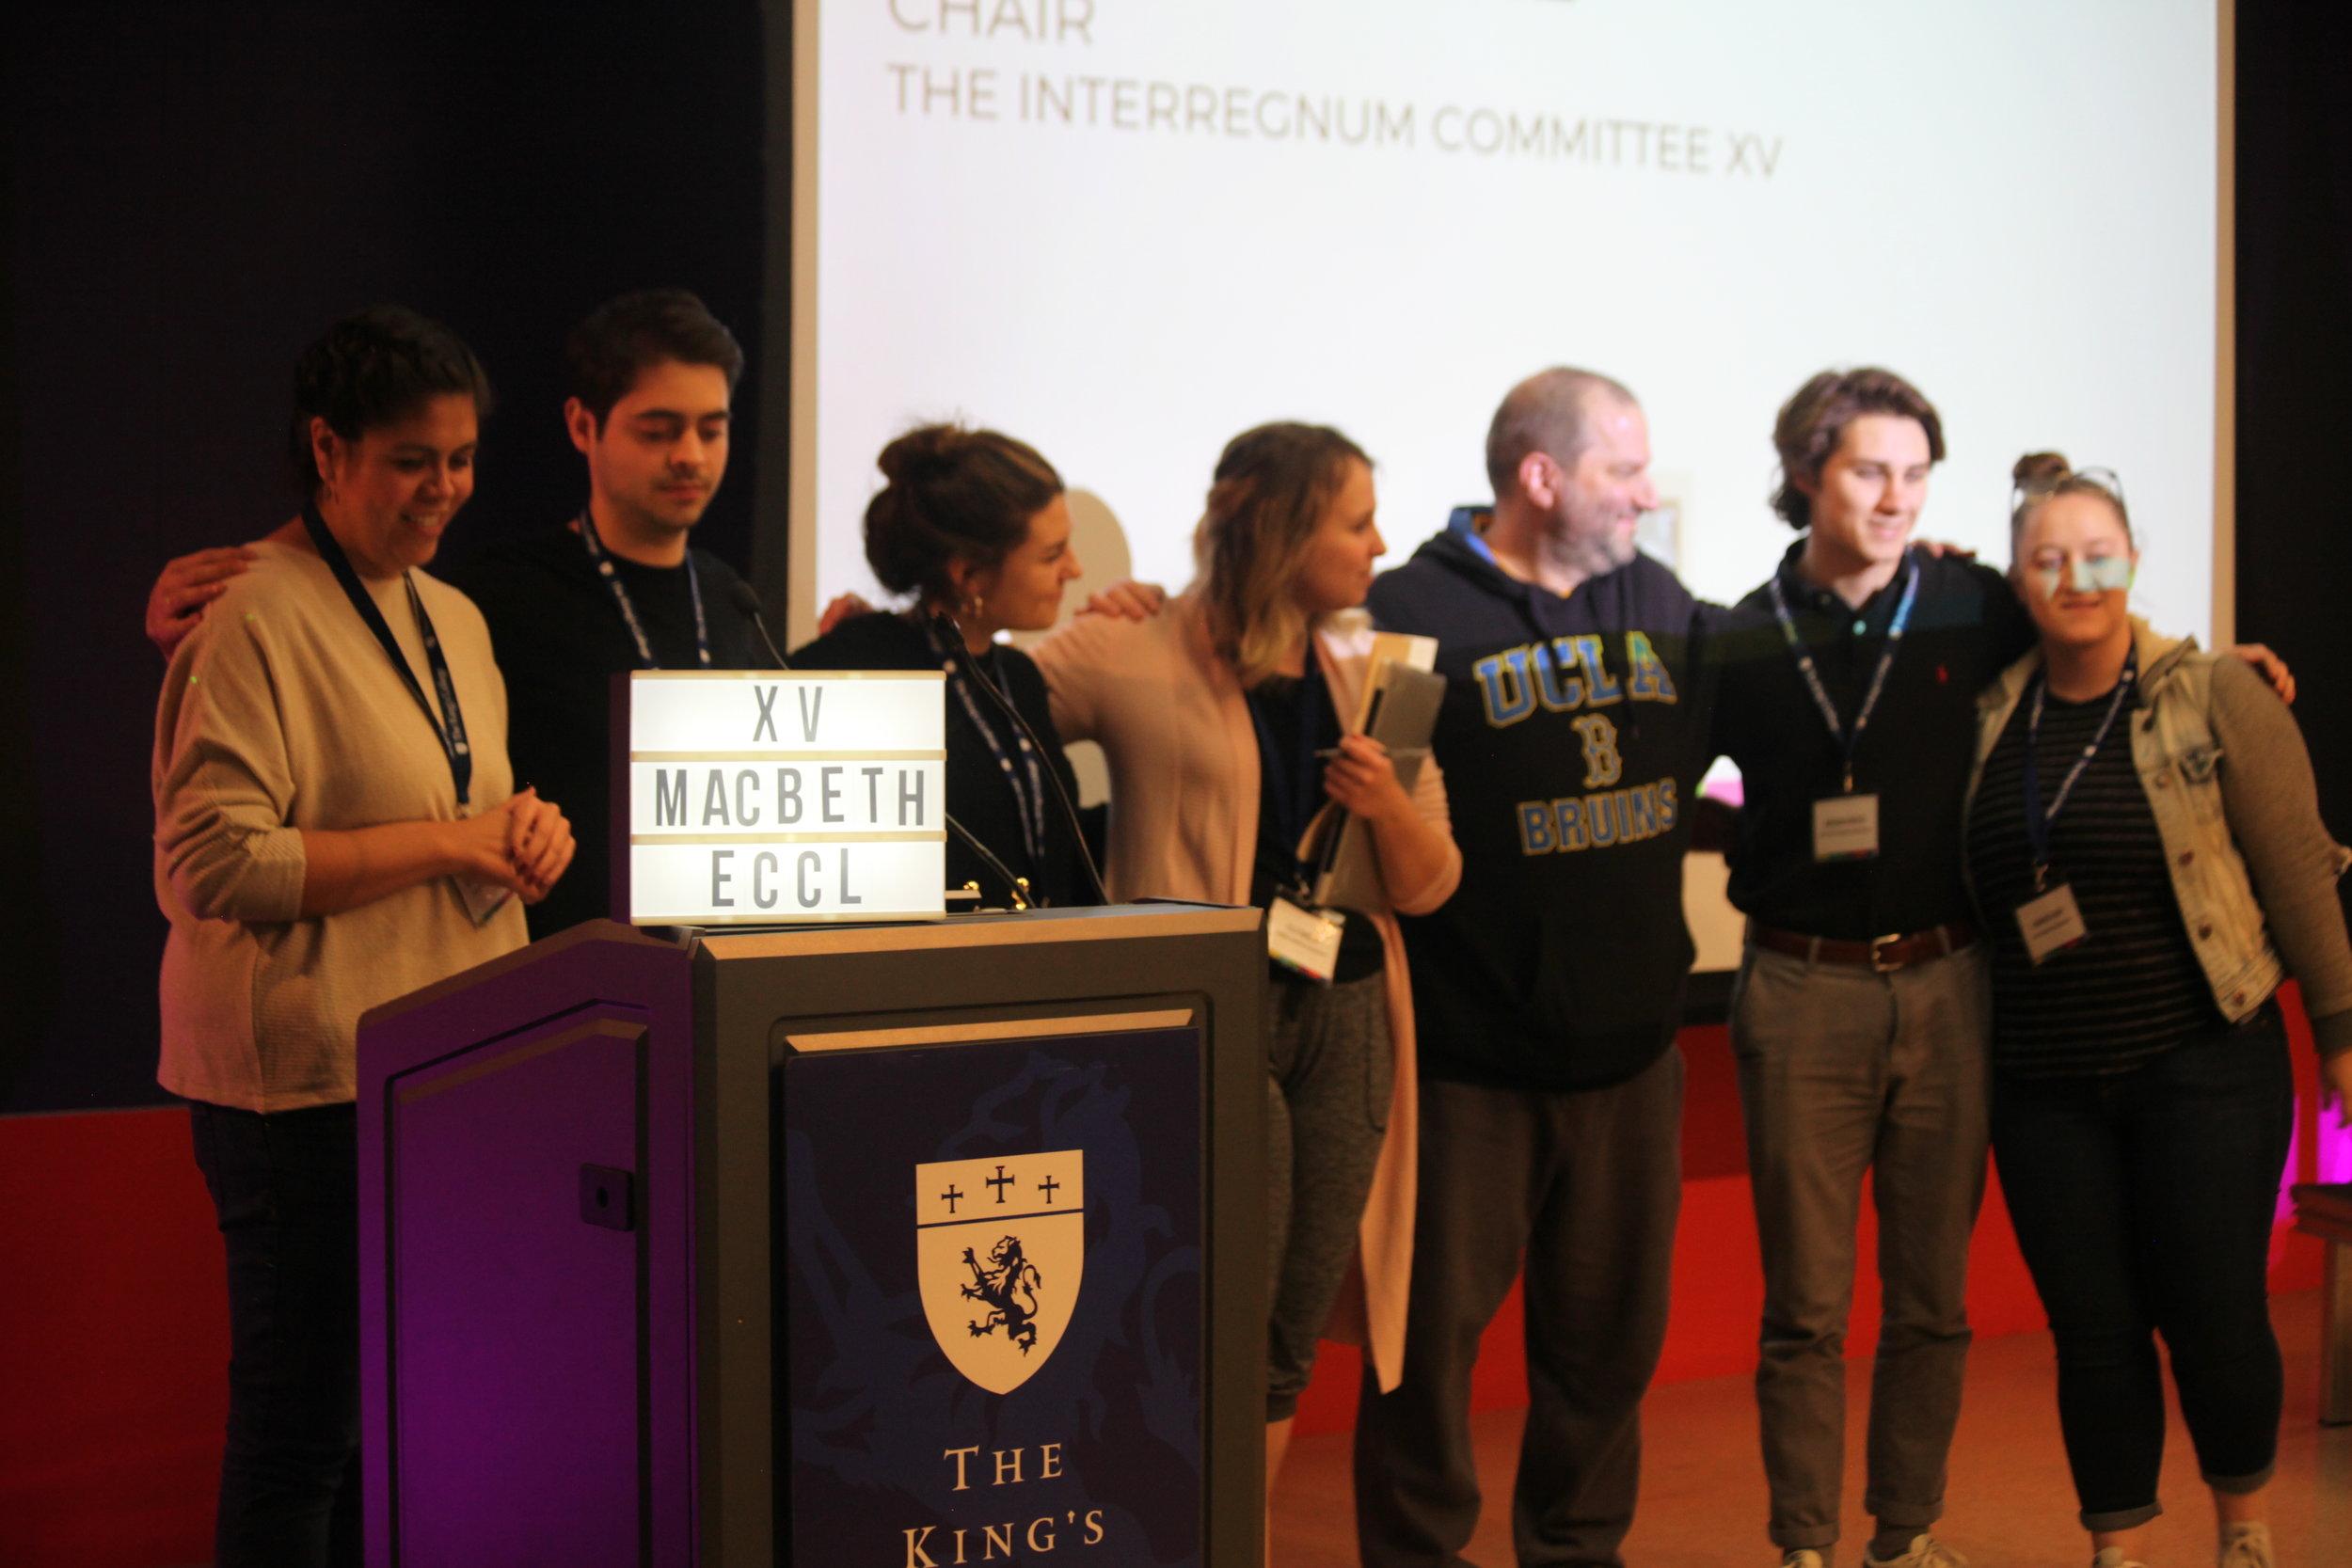 The Interregnum Committee. || Photo Credit to Elli Esher.